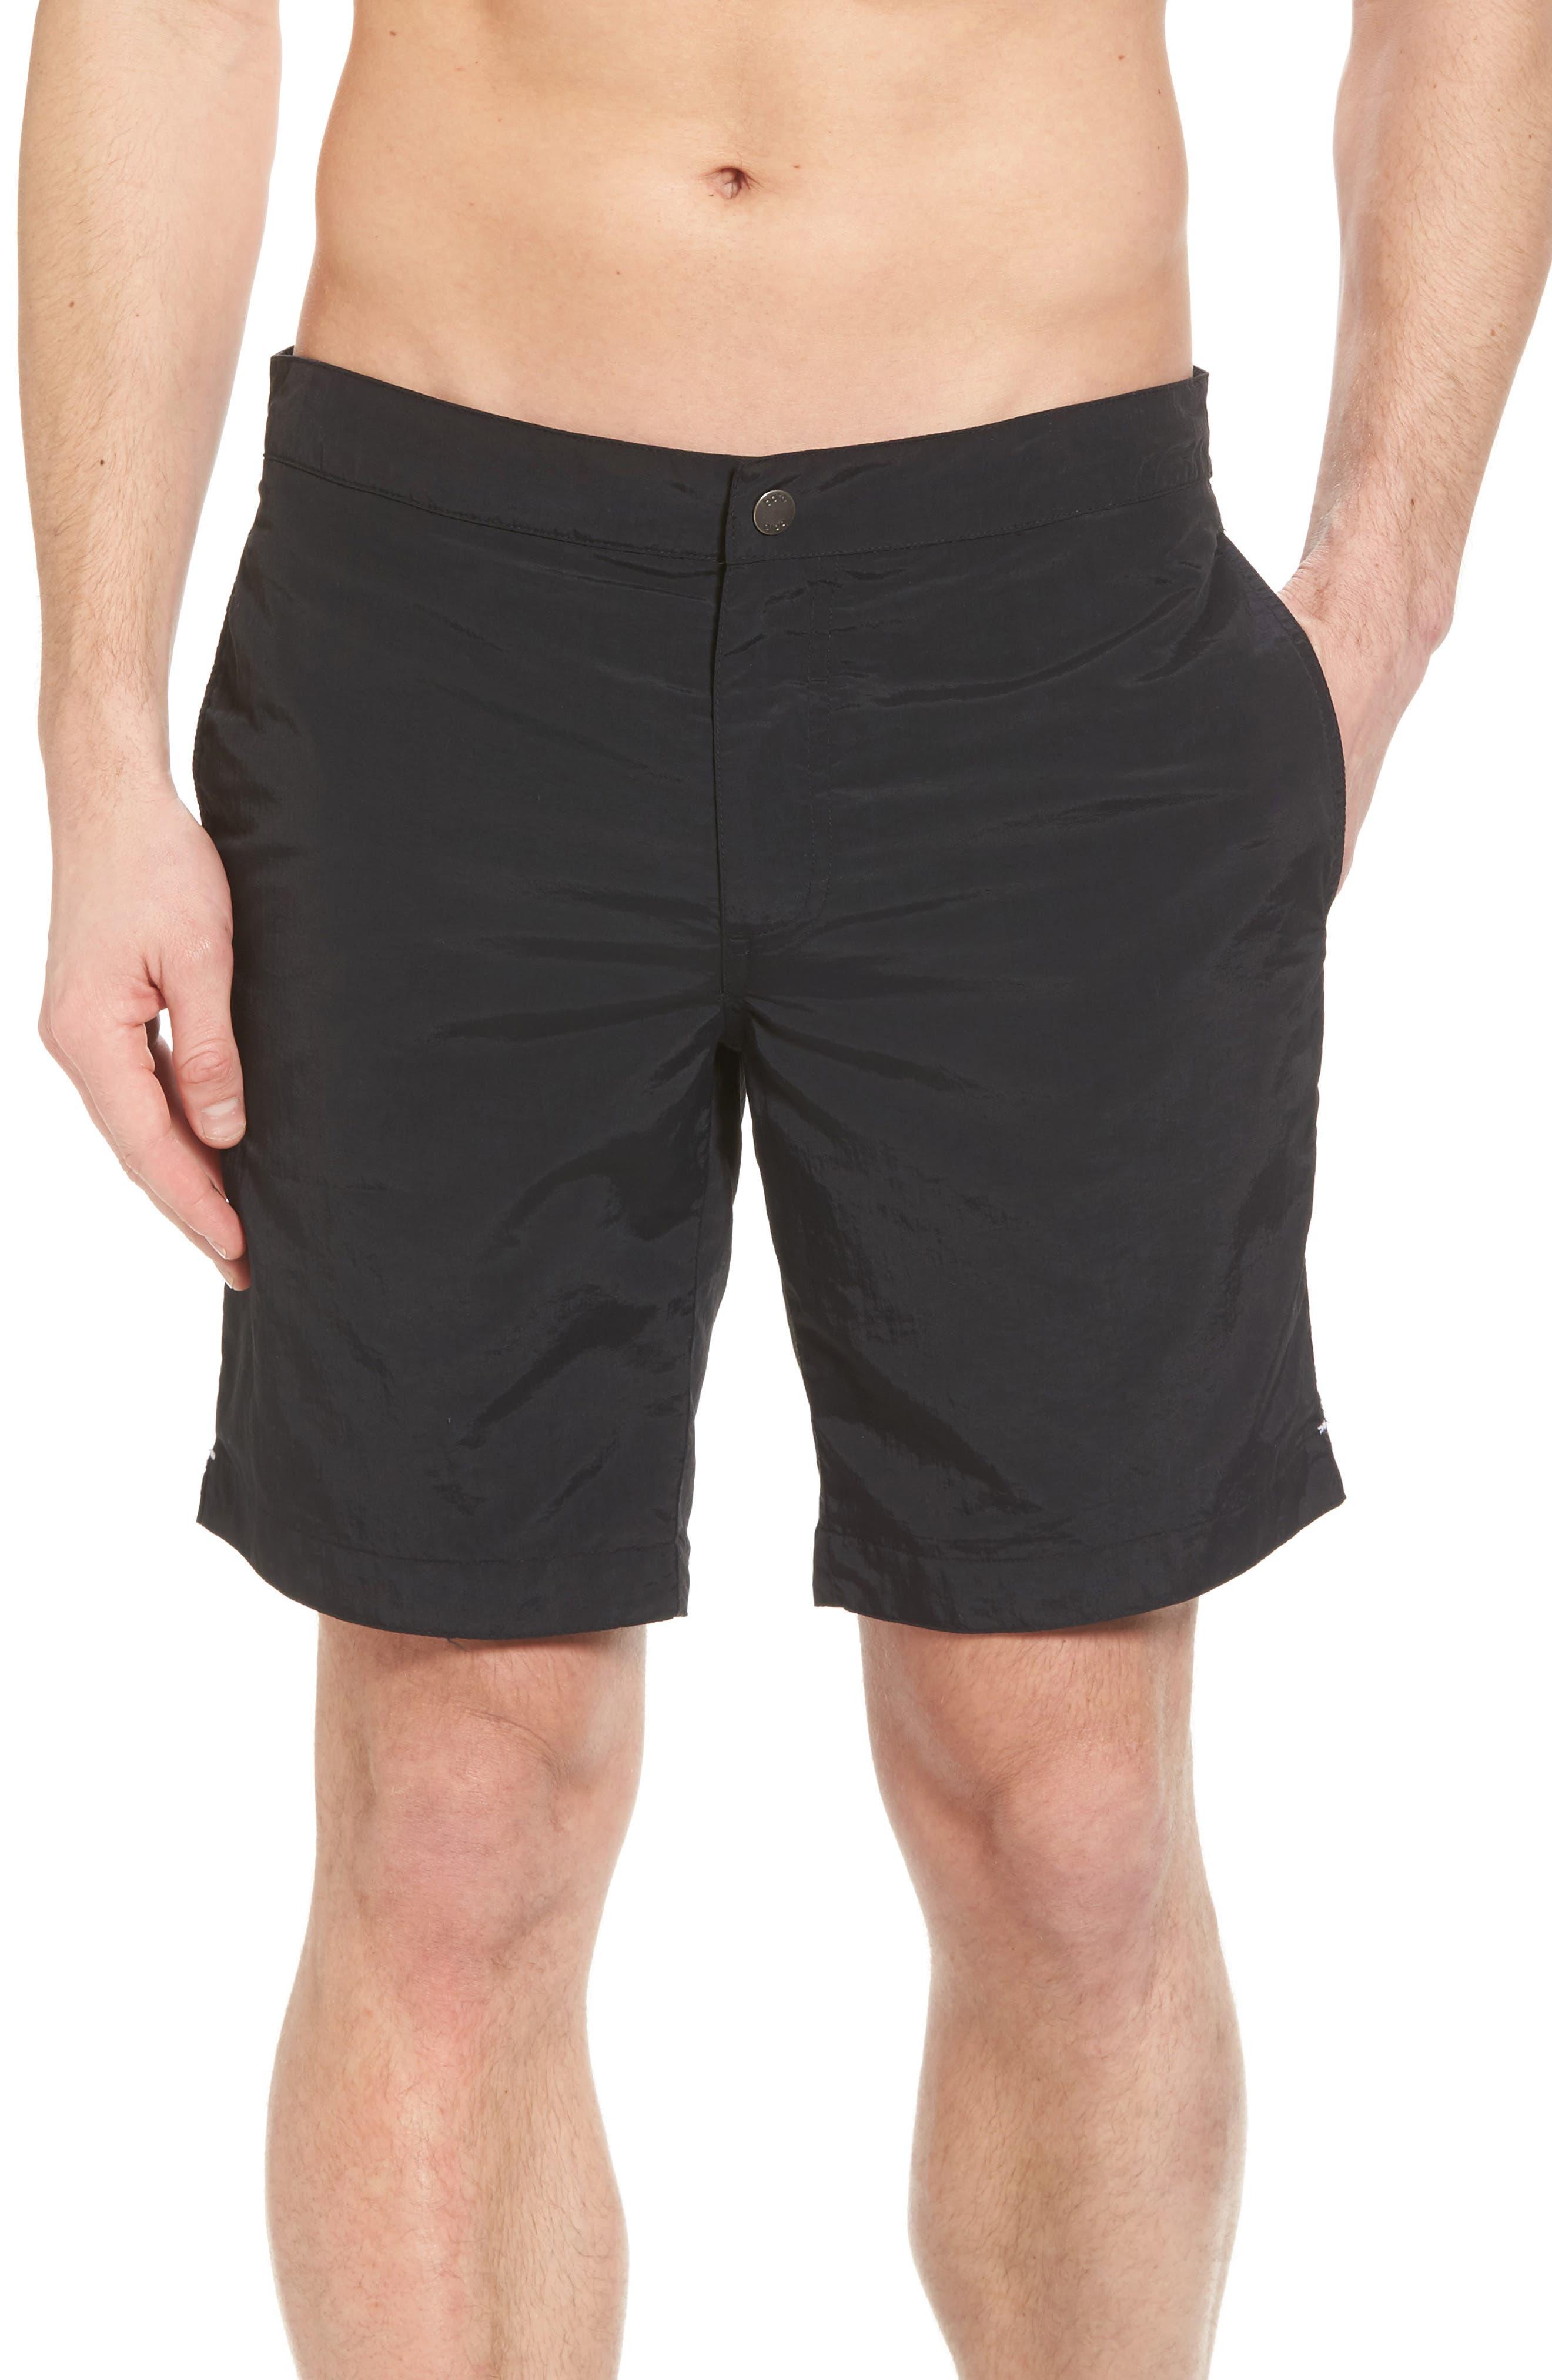 'Aruba - Island' Tailored Fit 8.5 Inch Board Shorts,                             Main thumbnail 1, color,                             001